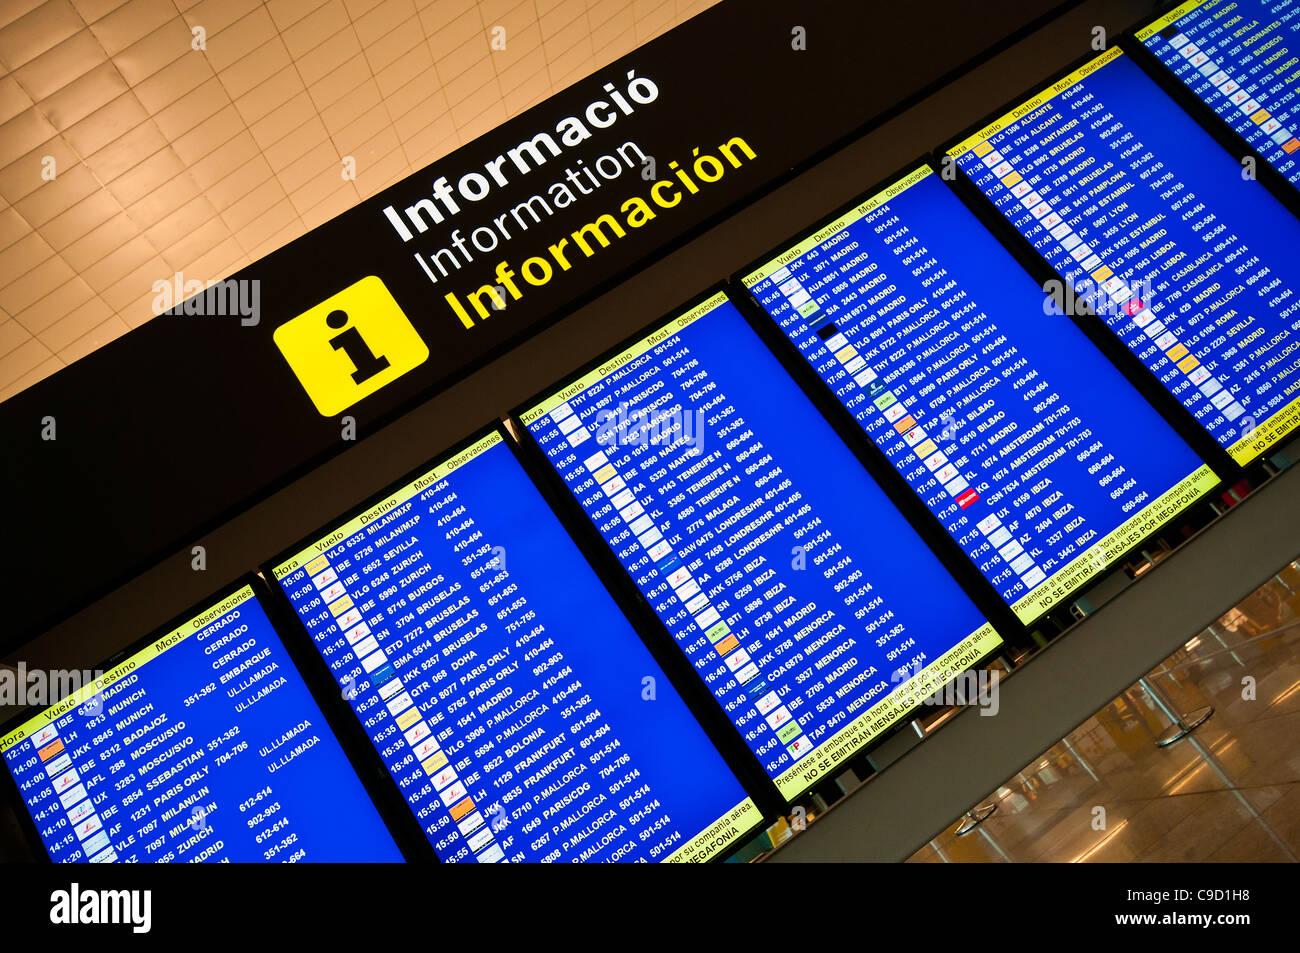 Departures electronic billboard, Barcelona El Prat international airport, Catalonia, Spain - Stock Image